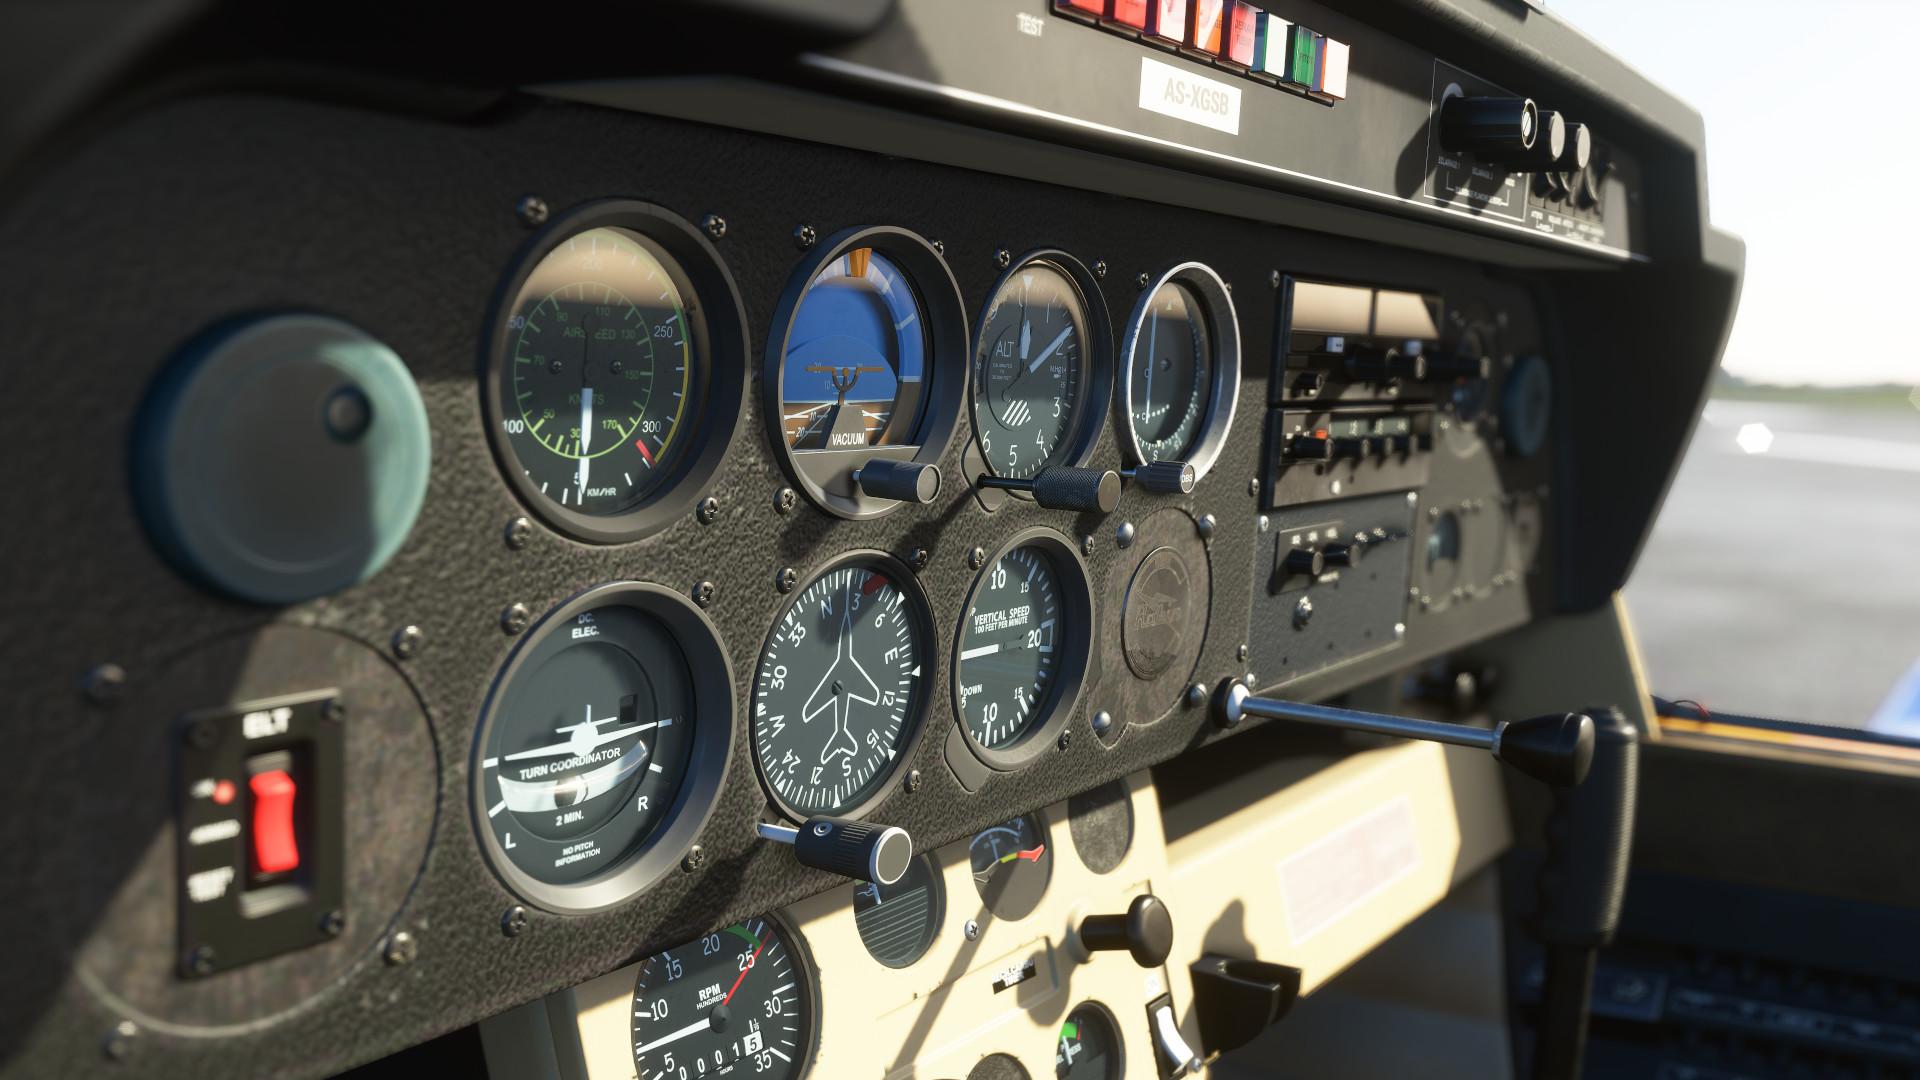 KHAiHOM.com - Microsoft Flight Simulator